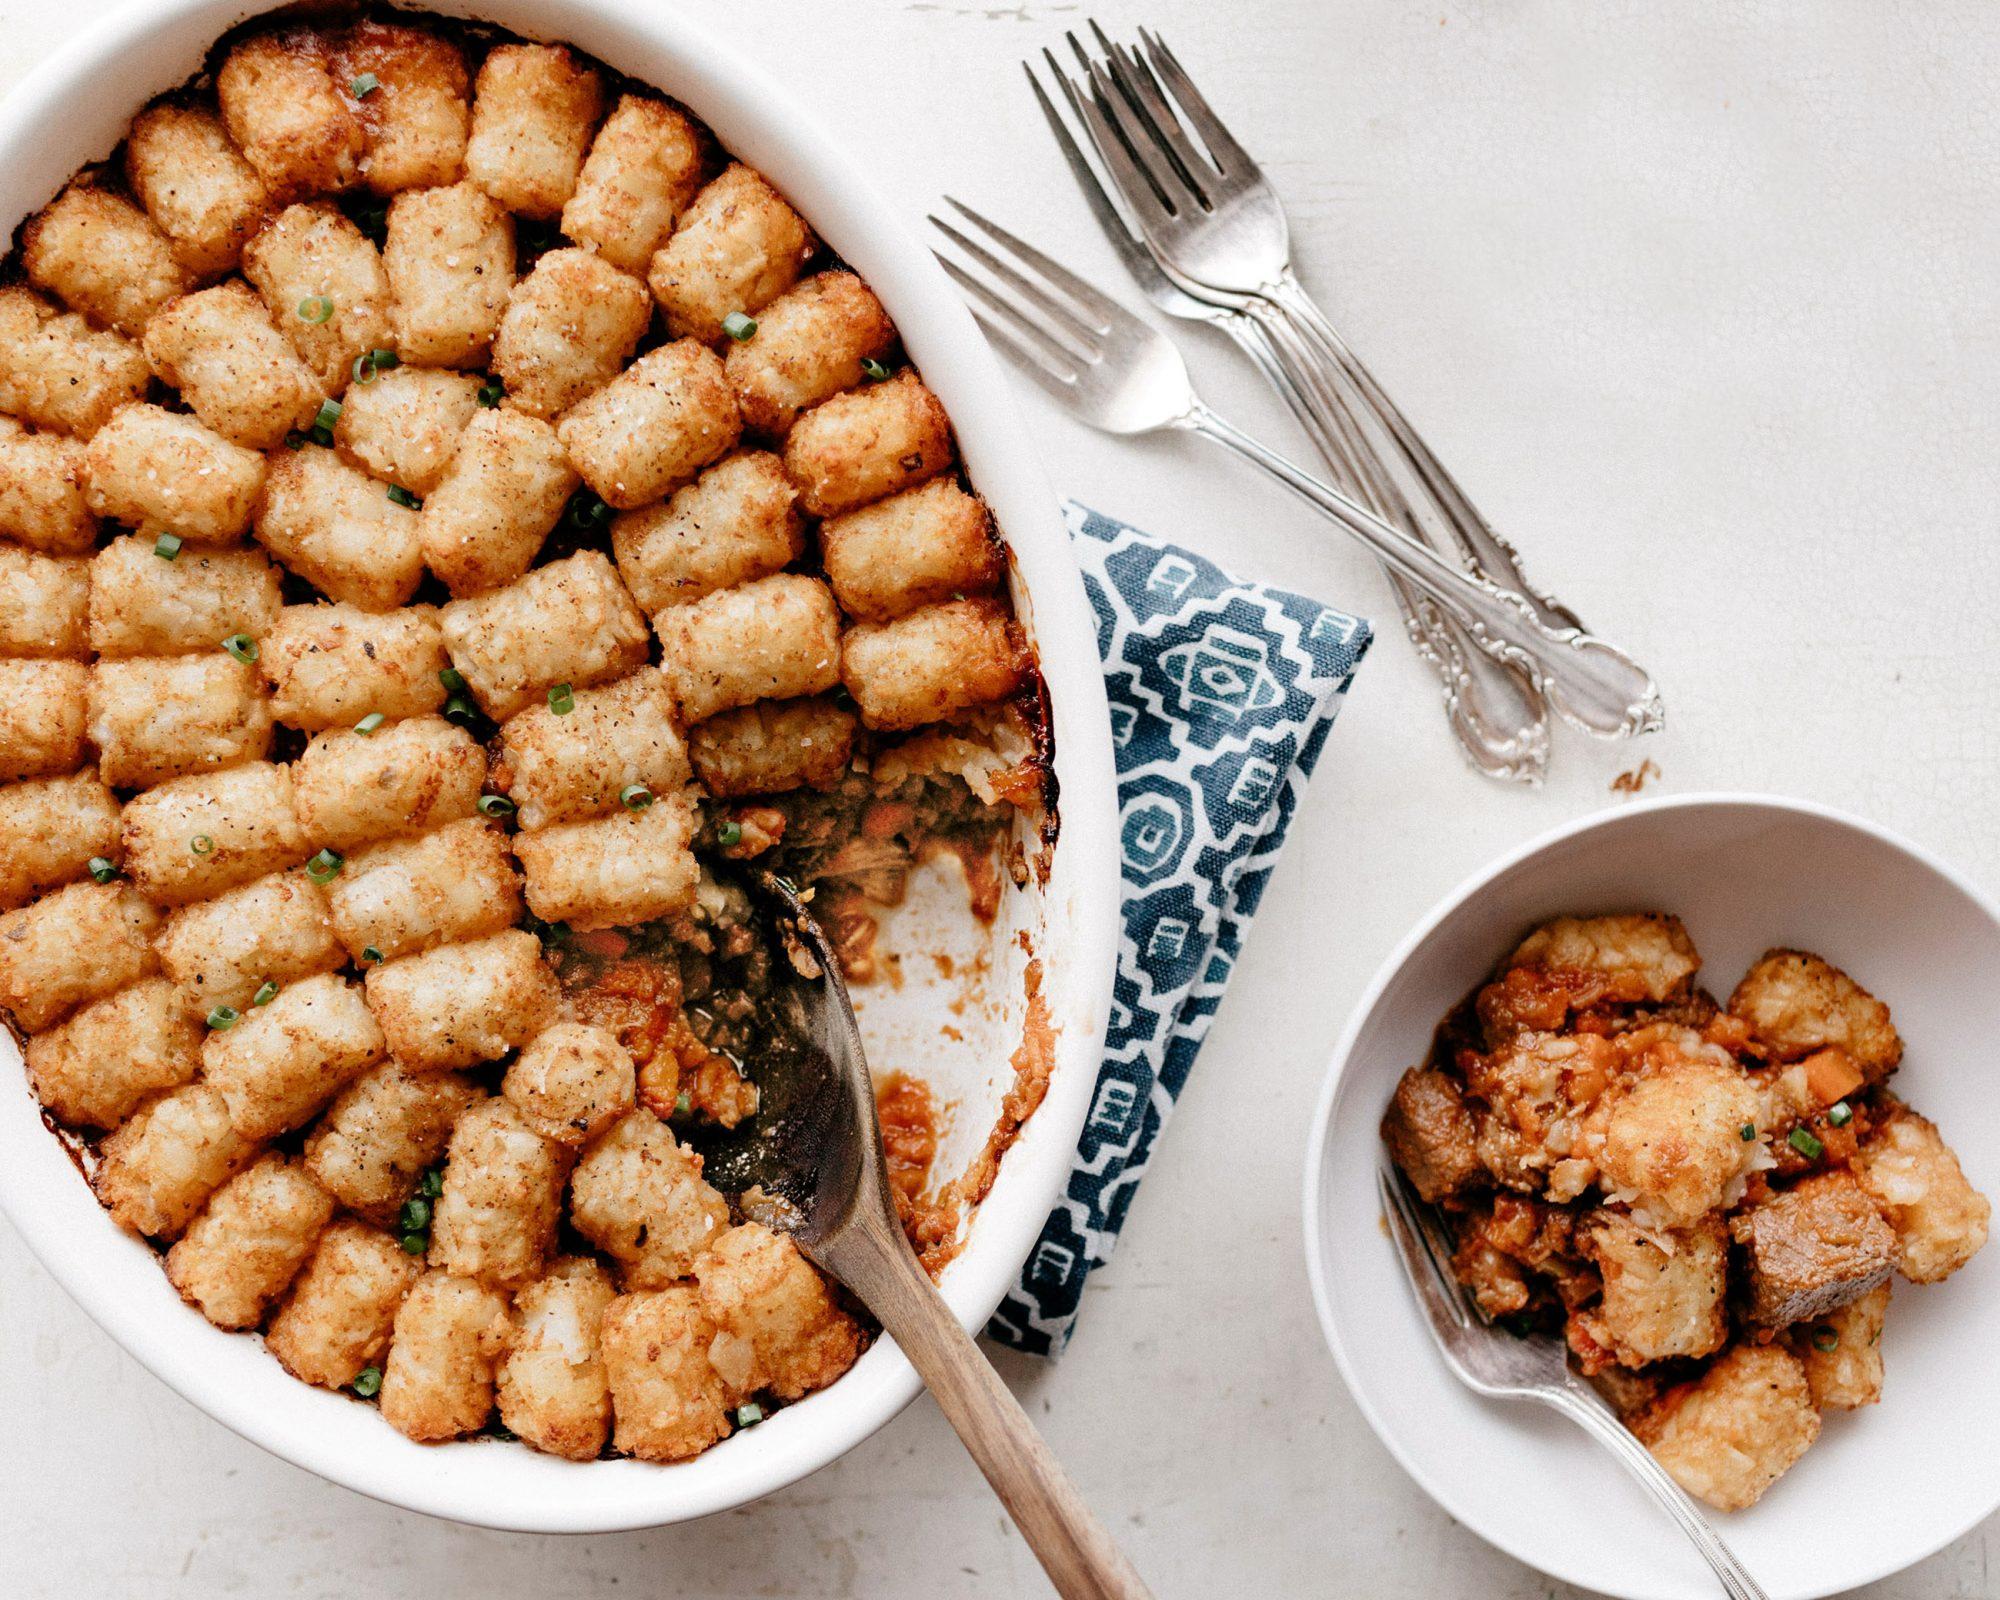 passover brisket hotdish